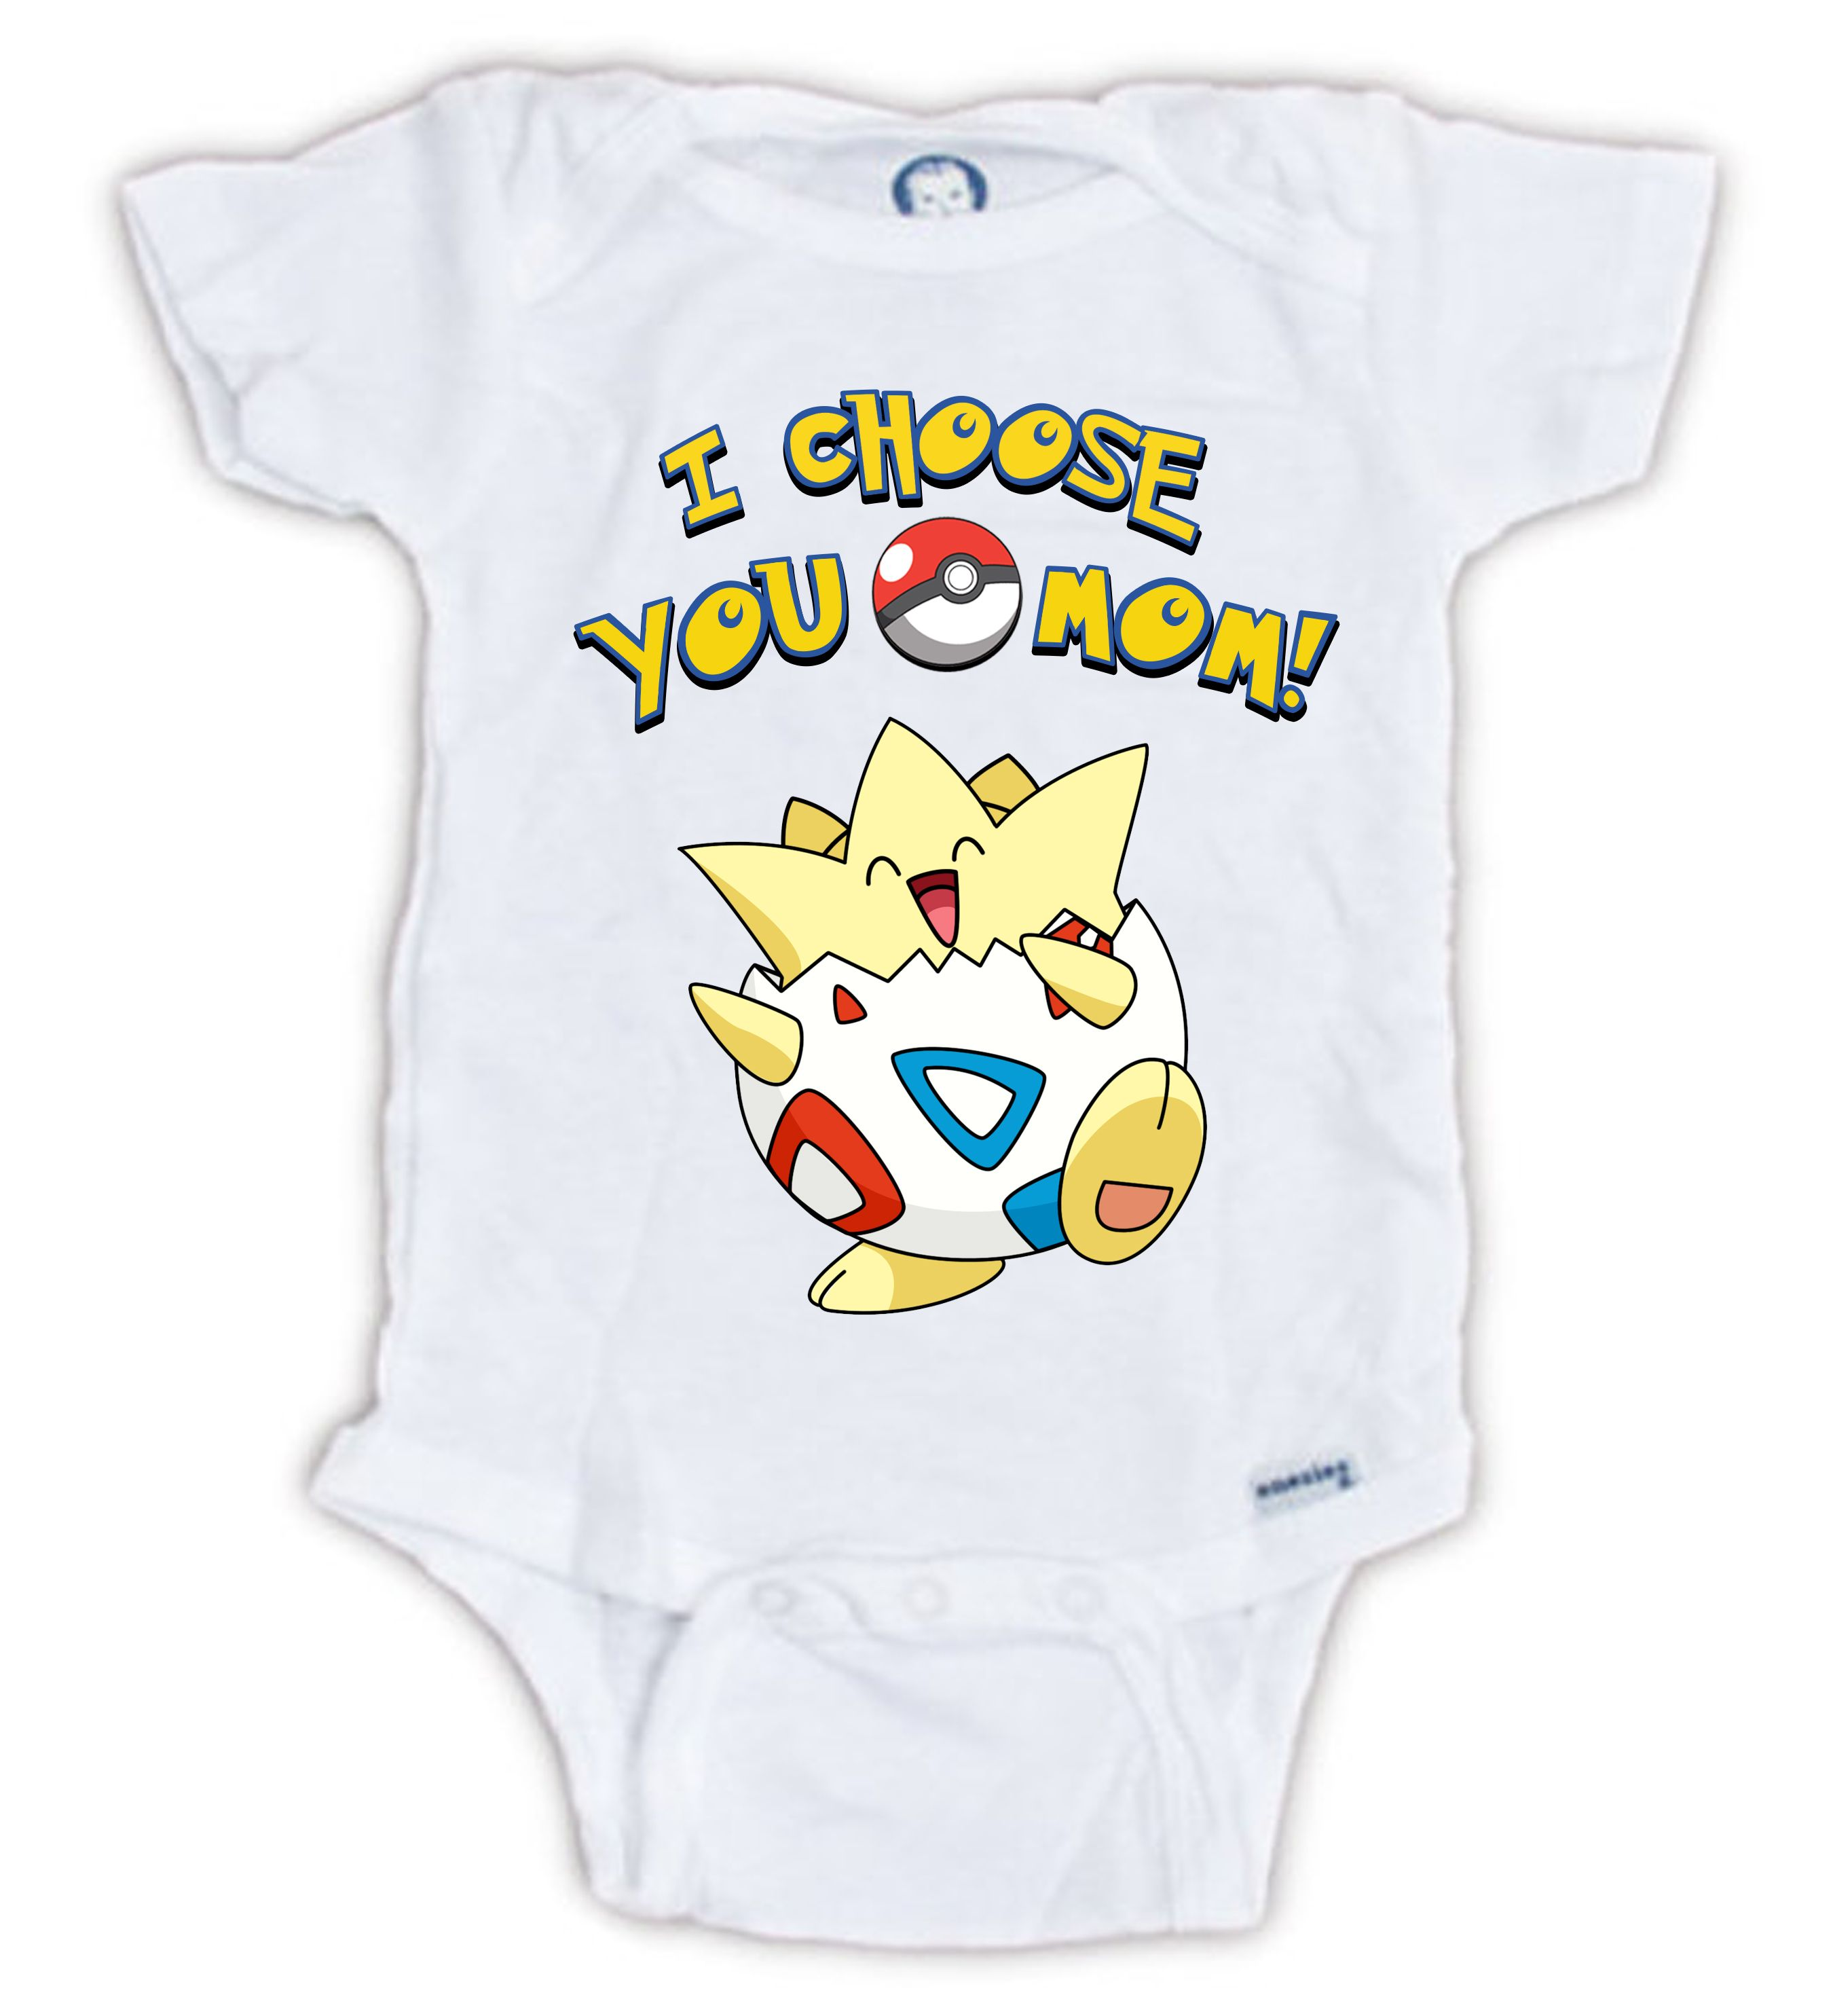 I choose you mom Cute POKEMON onesie Togepi Baby